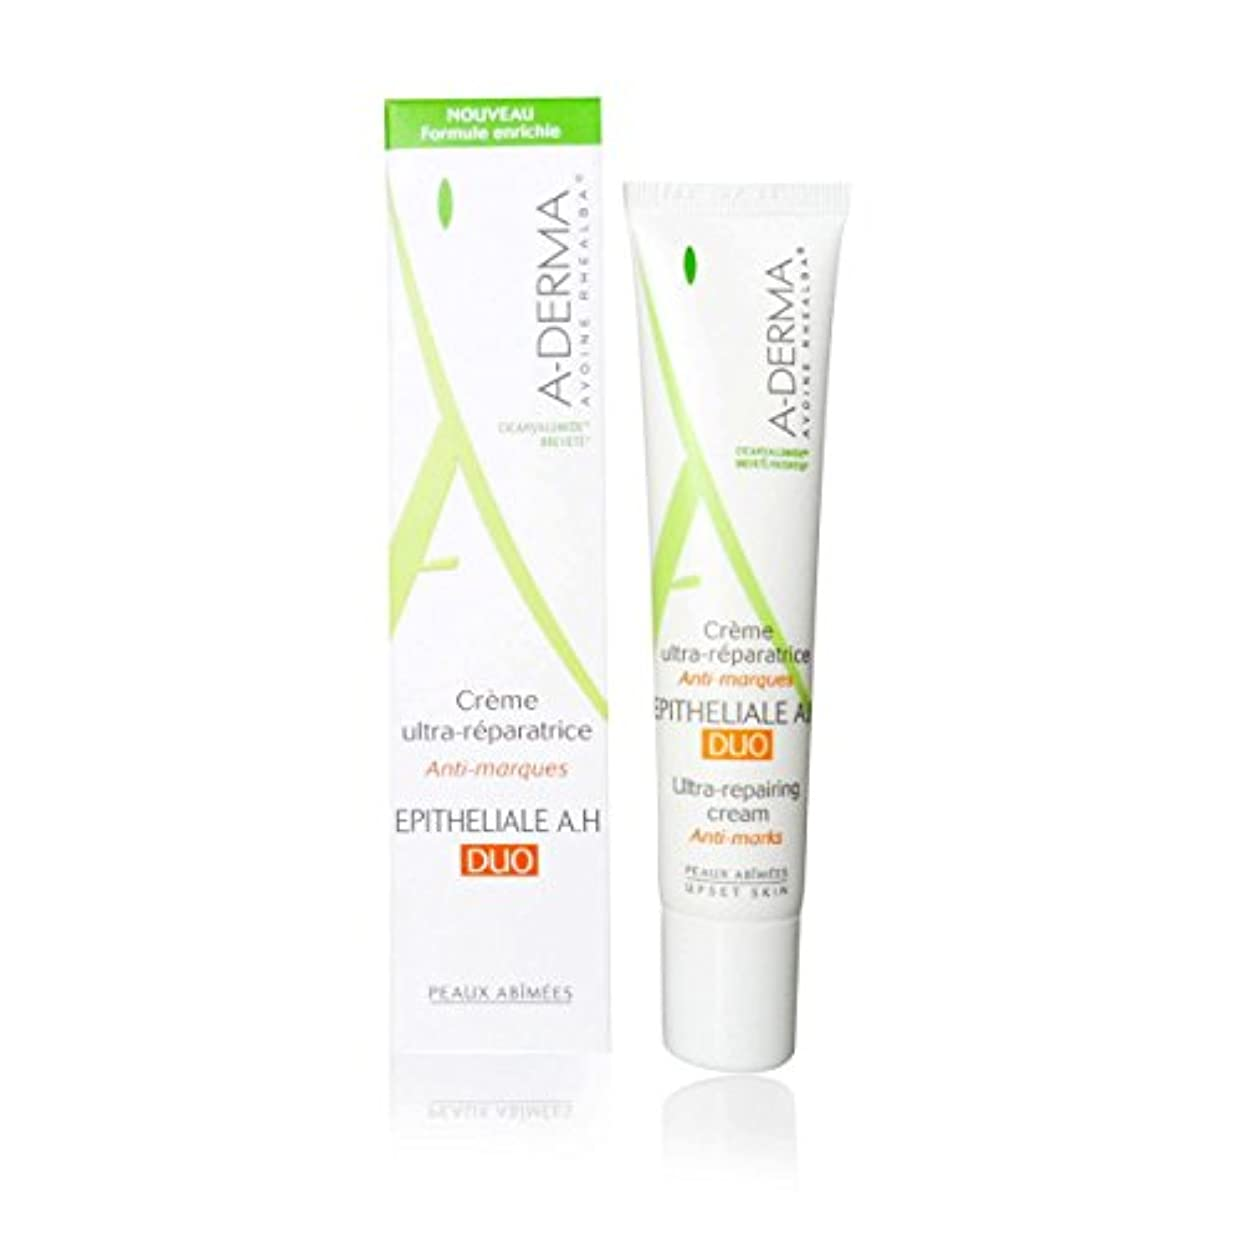 A-derma Epitheliale A.h. Duo Ultra-repairing Cream 40ml [並行輸入品]